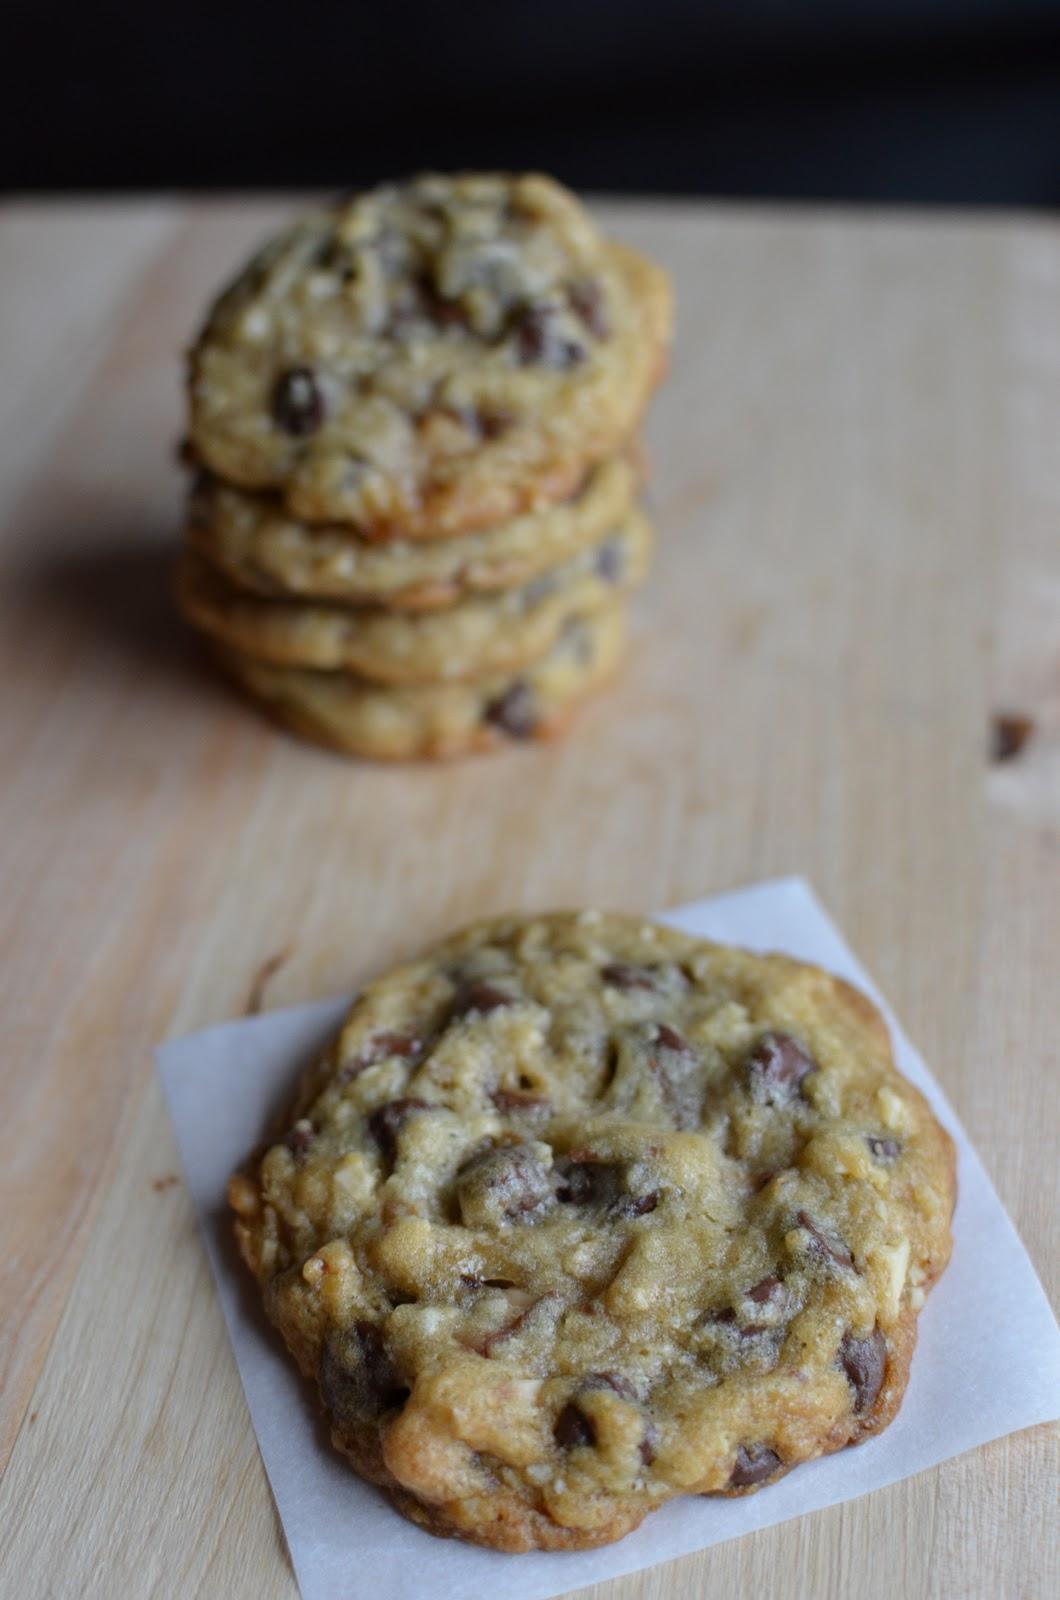 Chocolate Chip Hazelnut Cookie Calories